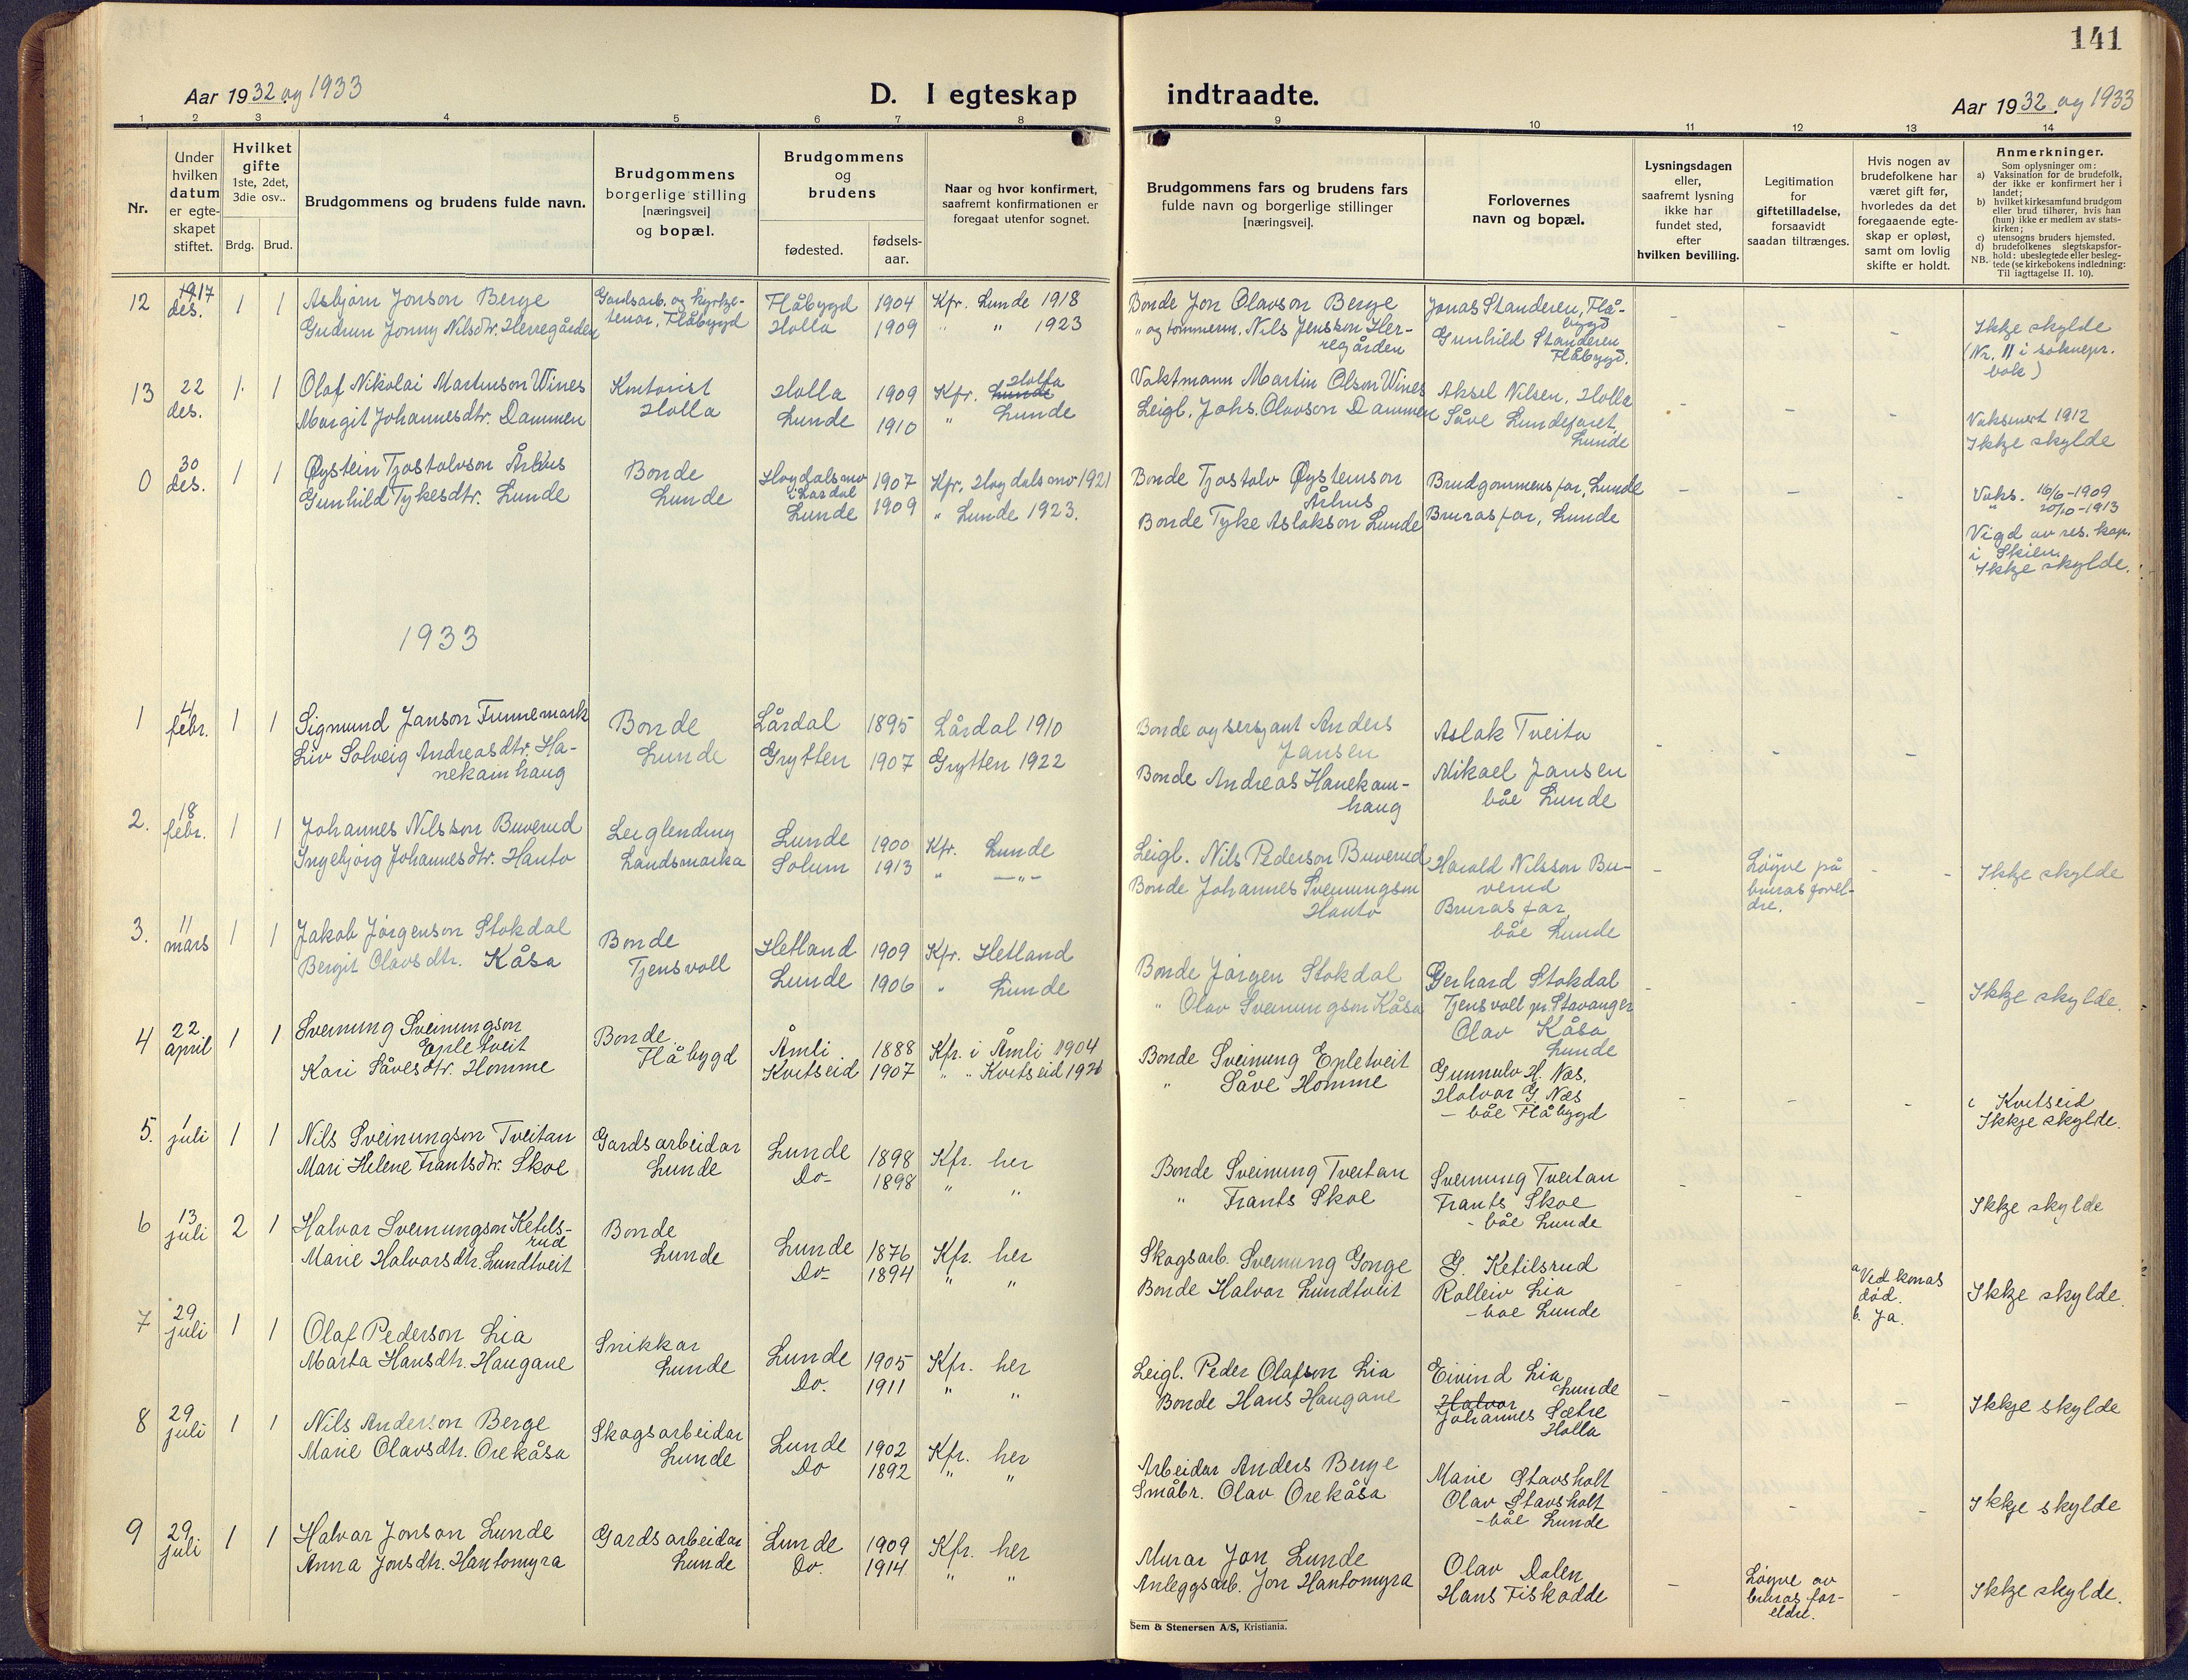 SAKO, Lunde kirkebøker, F/Fa/L0006: Ministerialbok nr. I 6, 1922-1940, s. 141